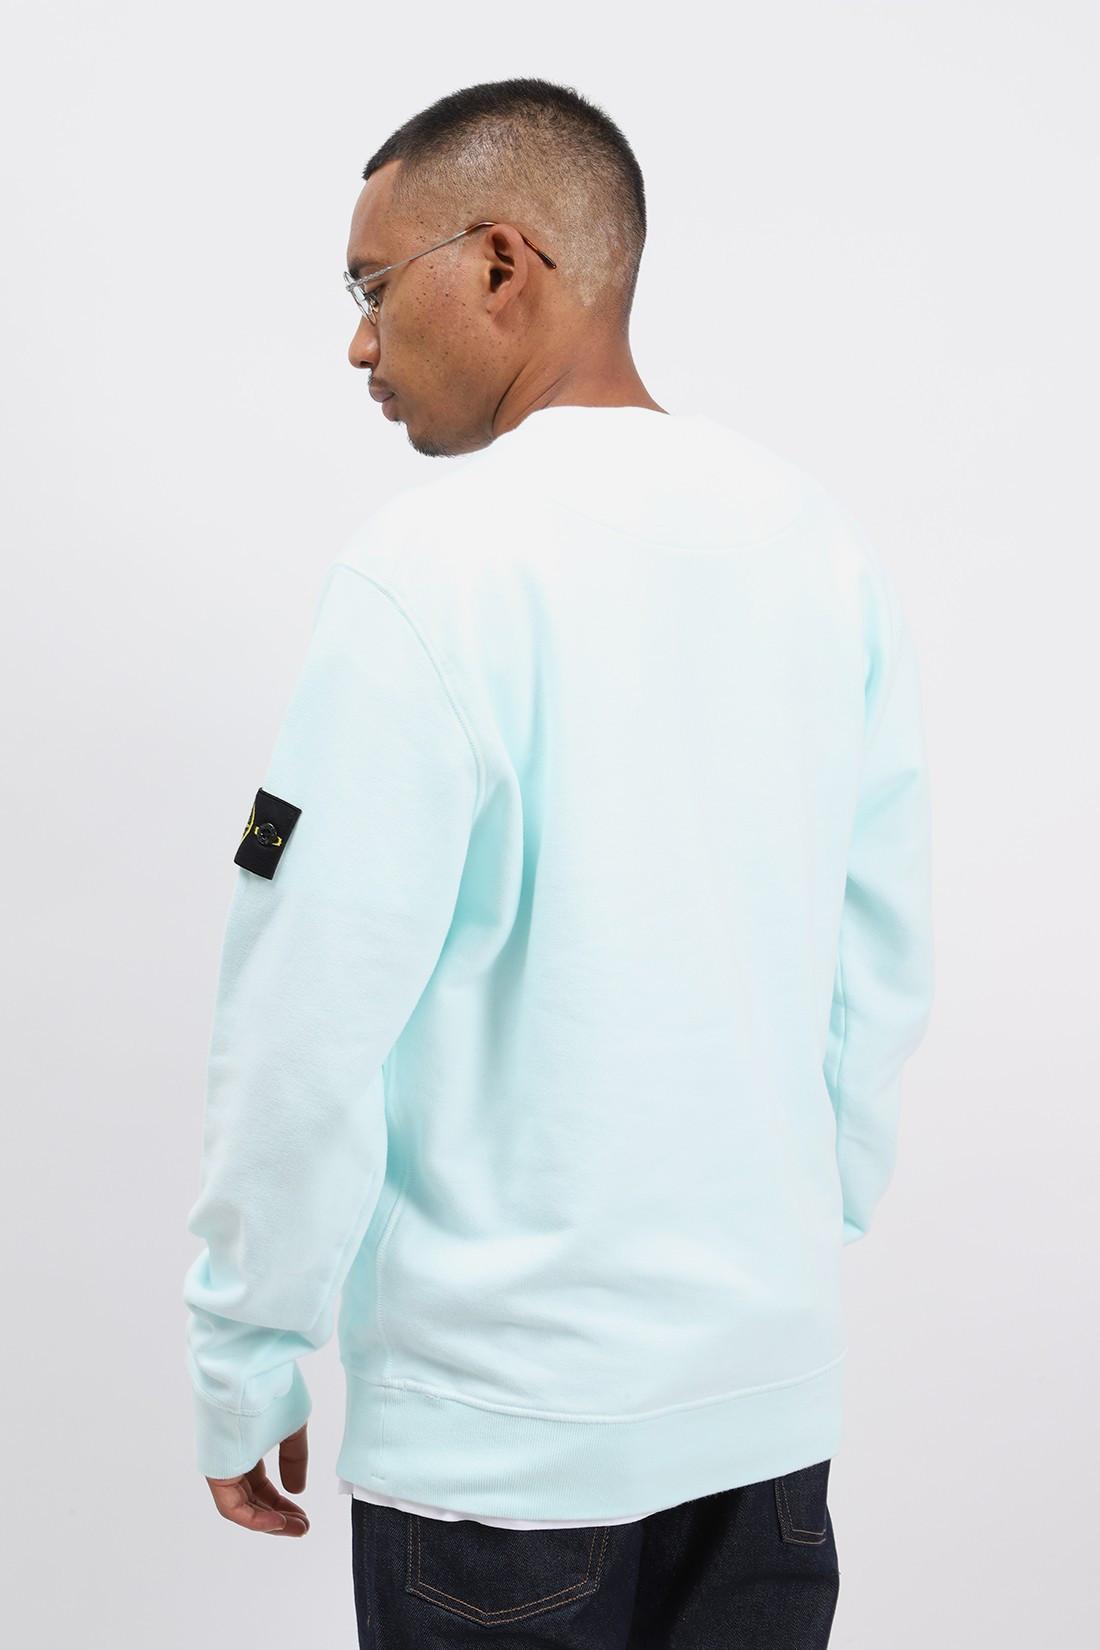 STONE ISLAND / 63020 crewneck sweater v0052 Verde chiaro